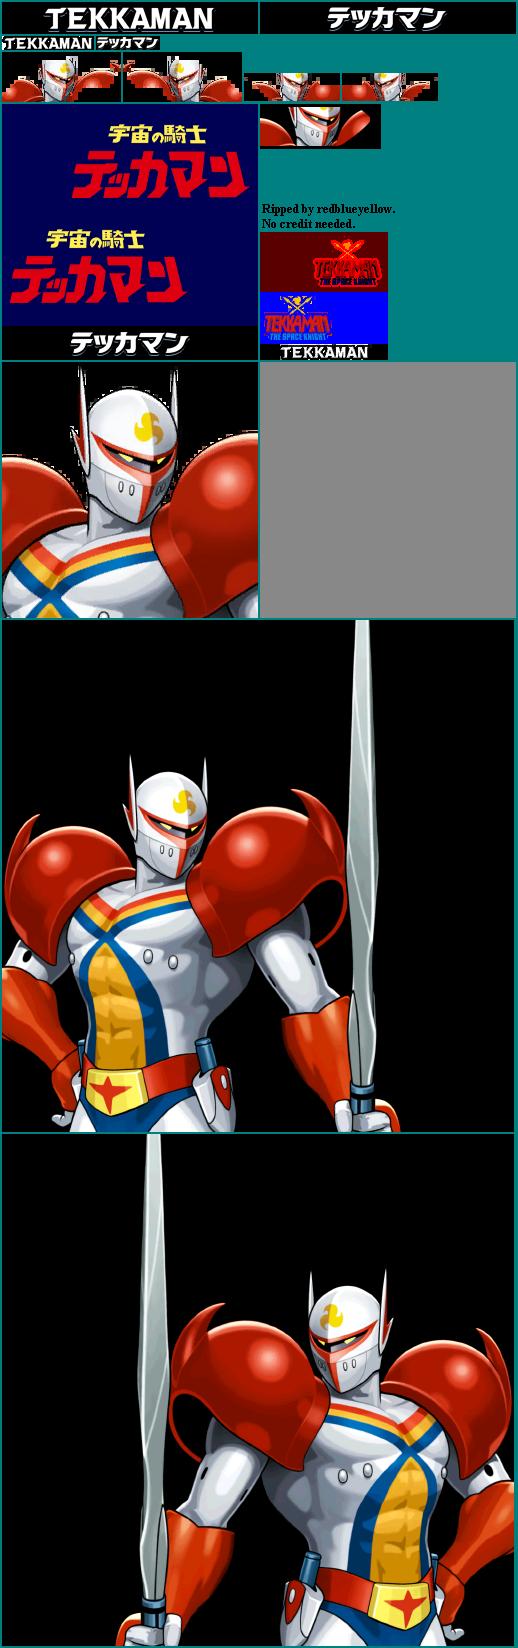 Images de Tatsunoko vs. Capcom : Tekkaman Blade dévoilé